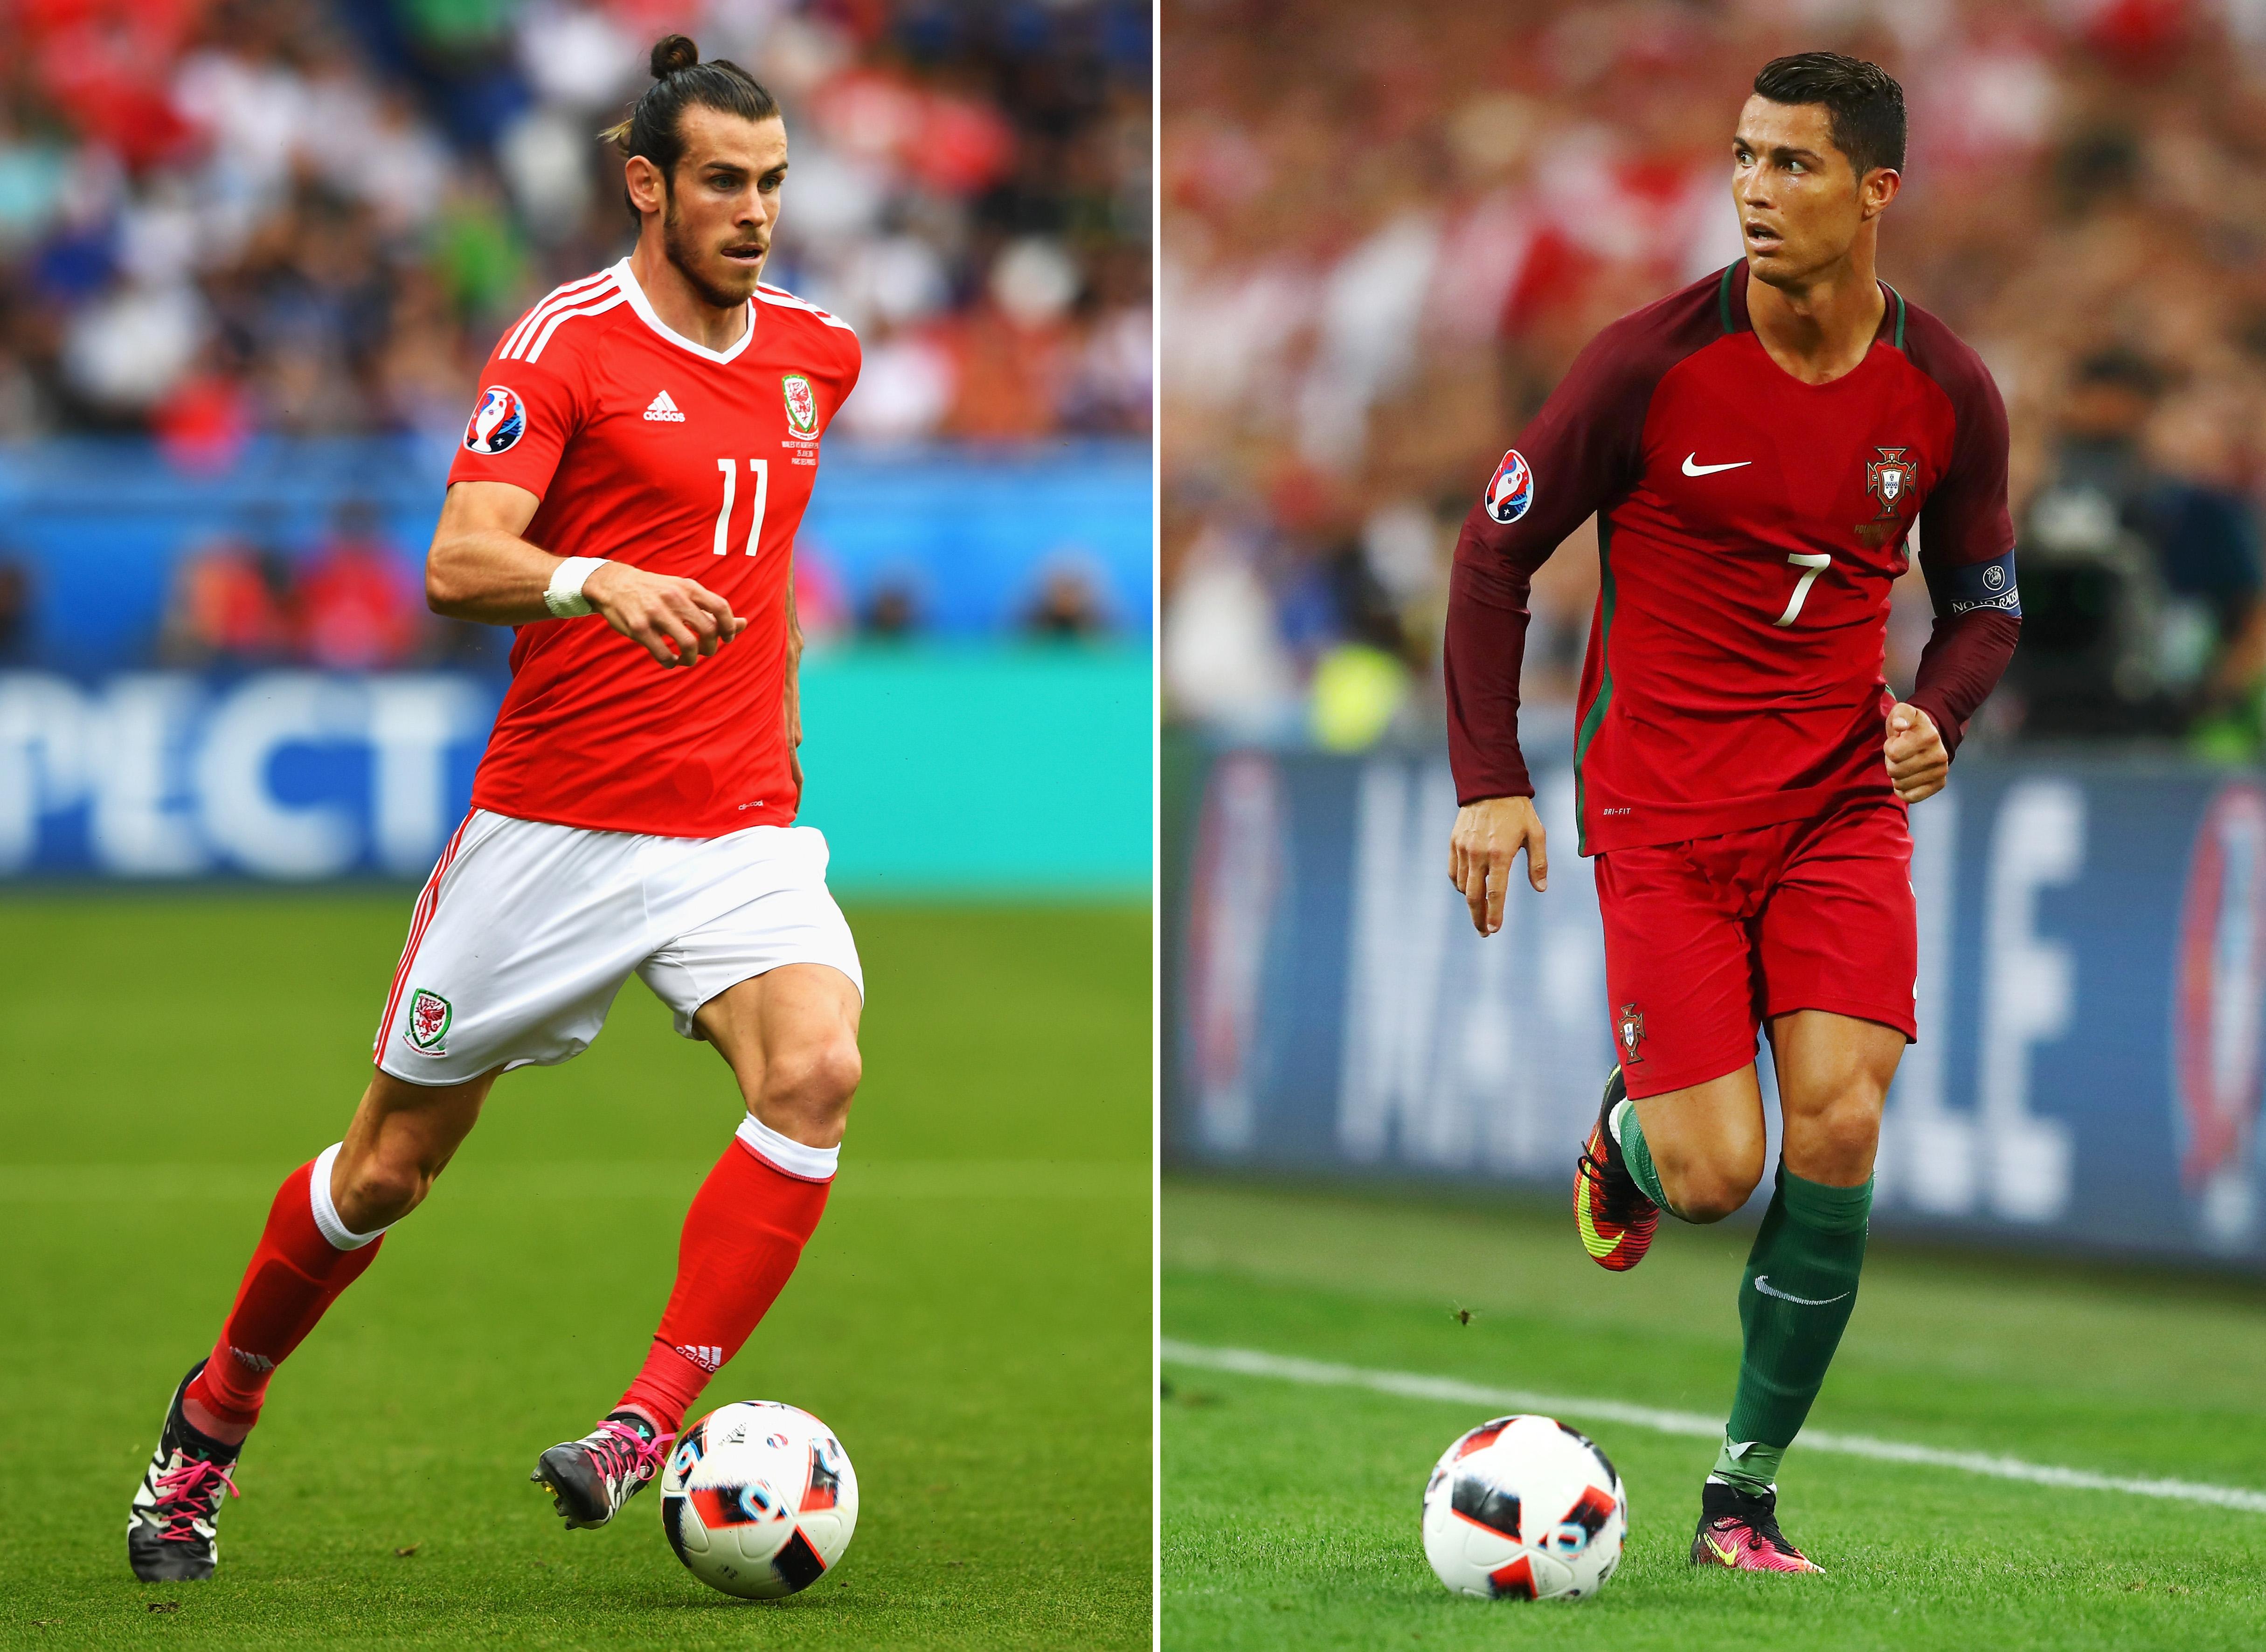 portugal vs. wales odds, wales vs. portgual prediction, portugal wales pick, portugal wales odds, portugal wales prediction, portugal wales pick against the spread, portugal wales winner